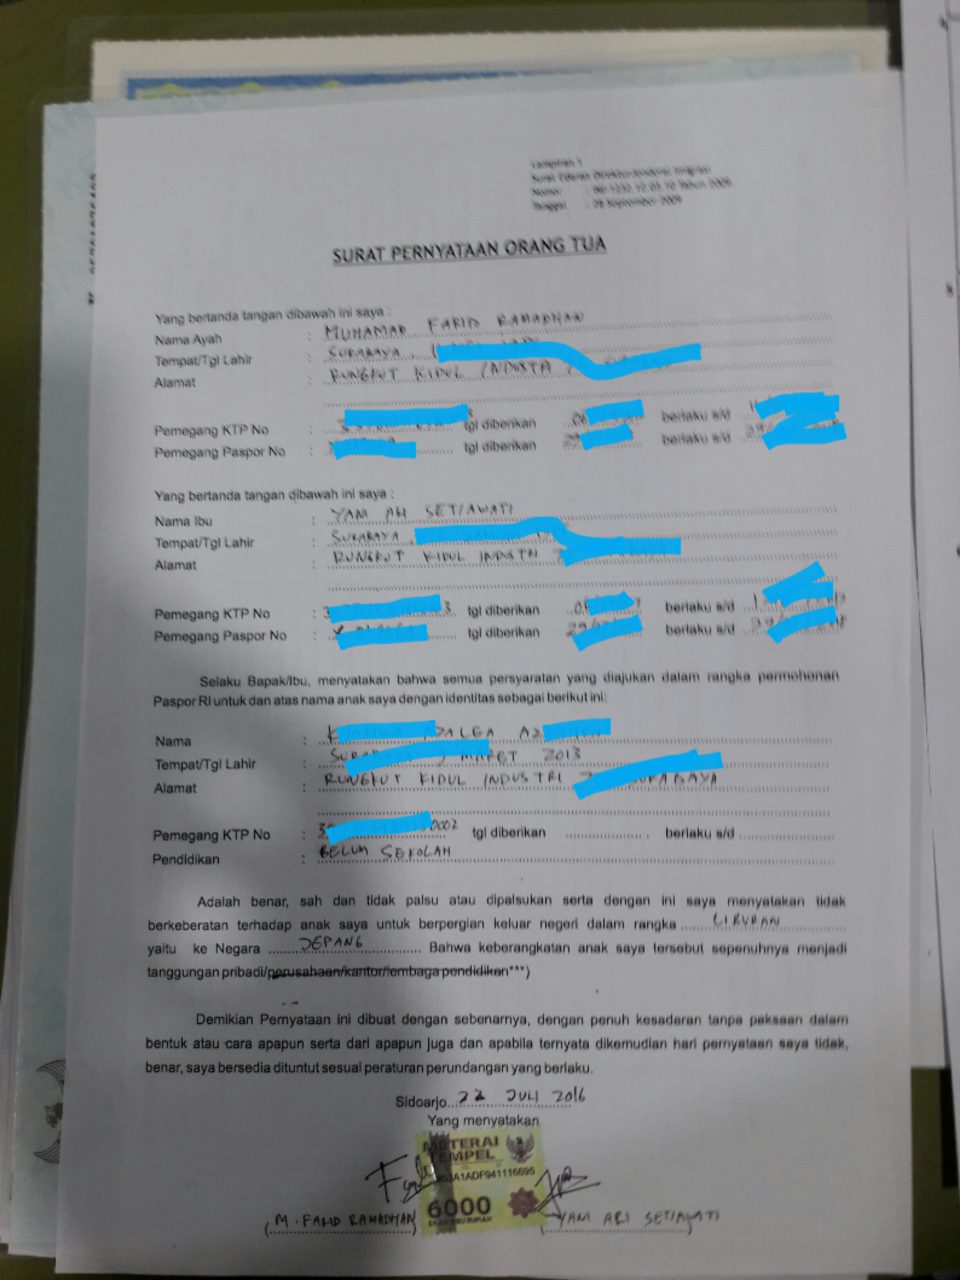 surat pernyataan orang tua e paspor anak surabaya